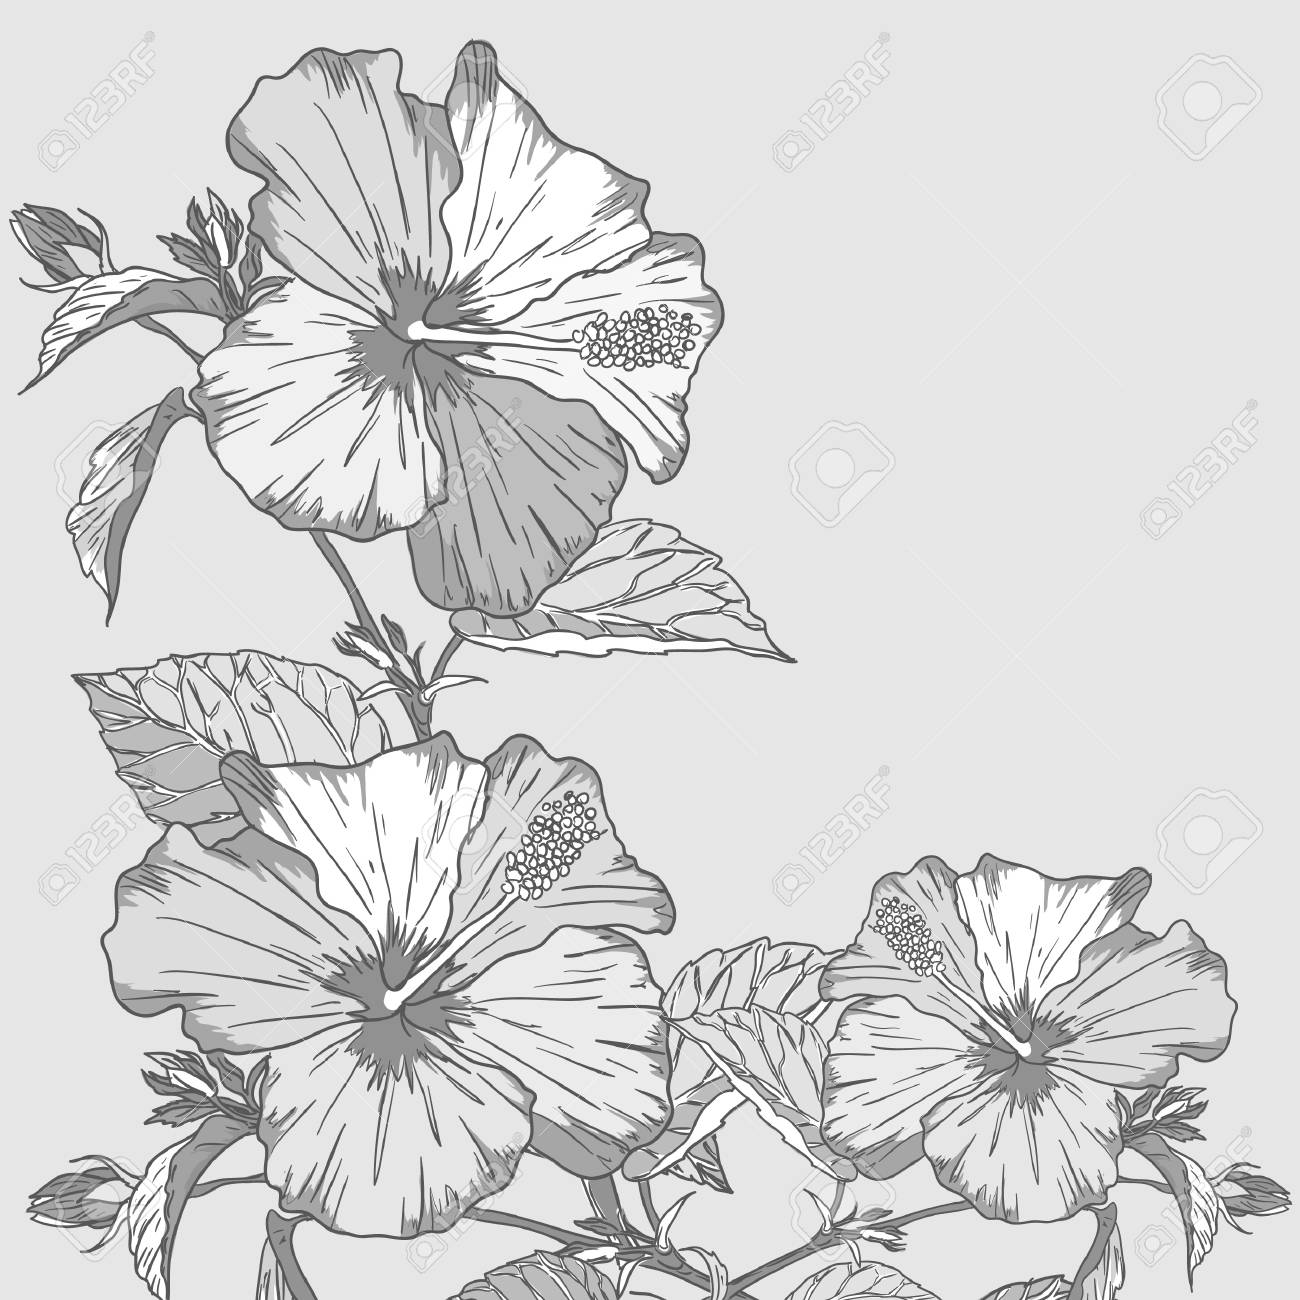 Design floral element. Stock Photo - 9251632